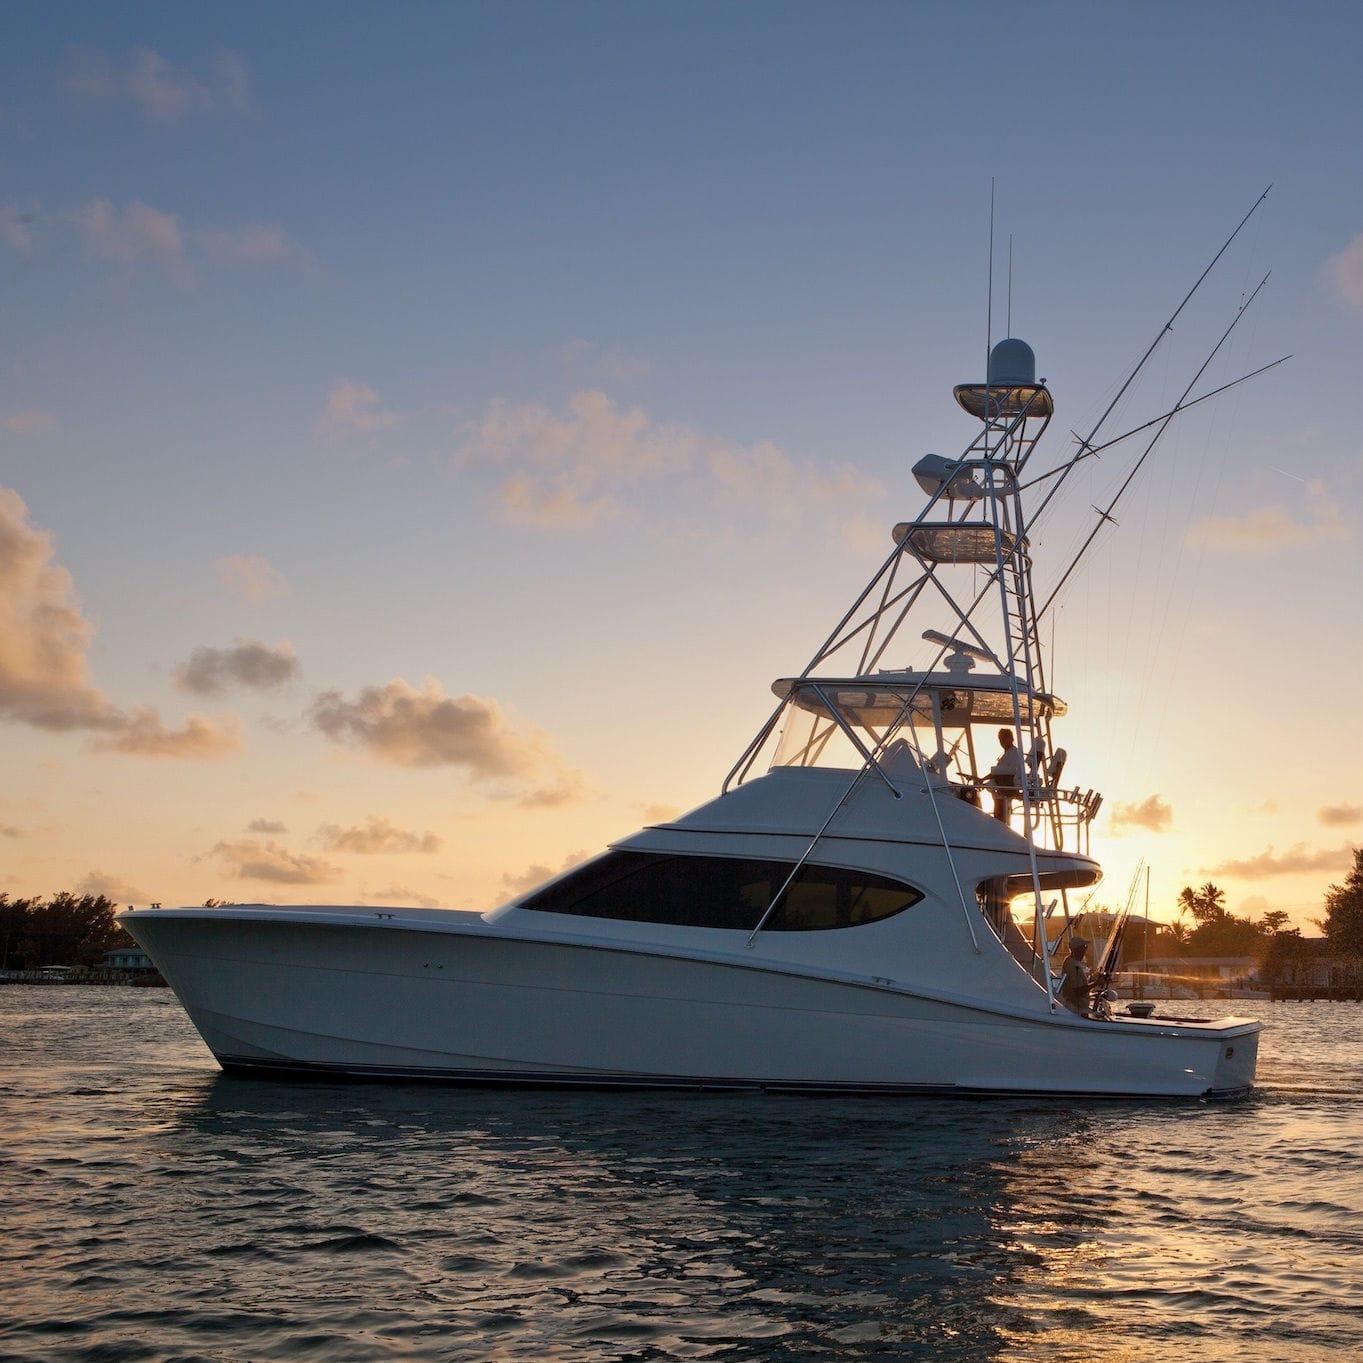 sport-fishing motor yacht / convertible / flybridge / planing hull - 54